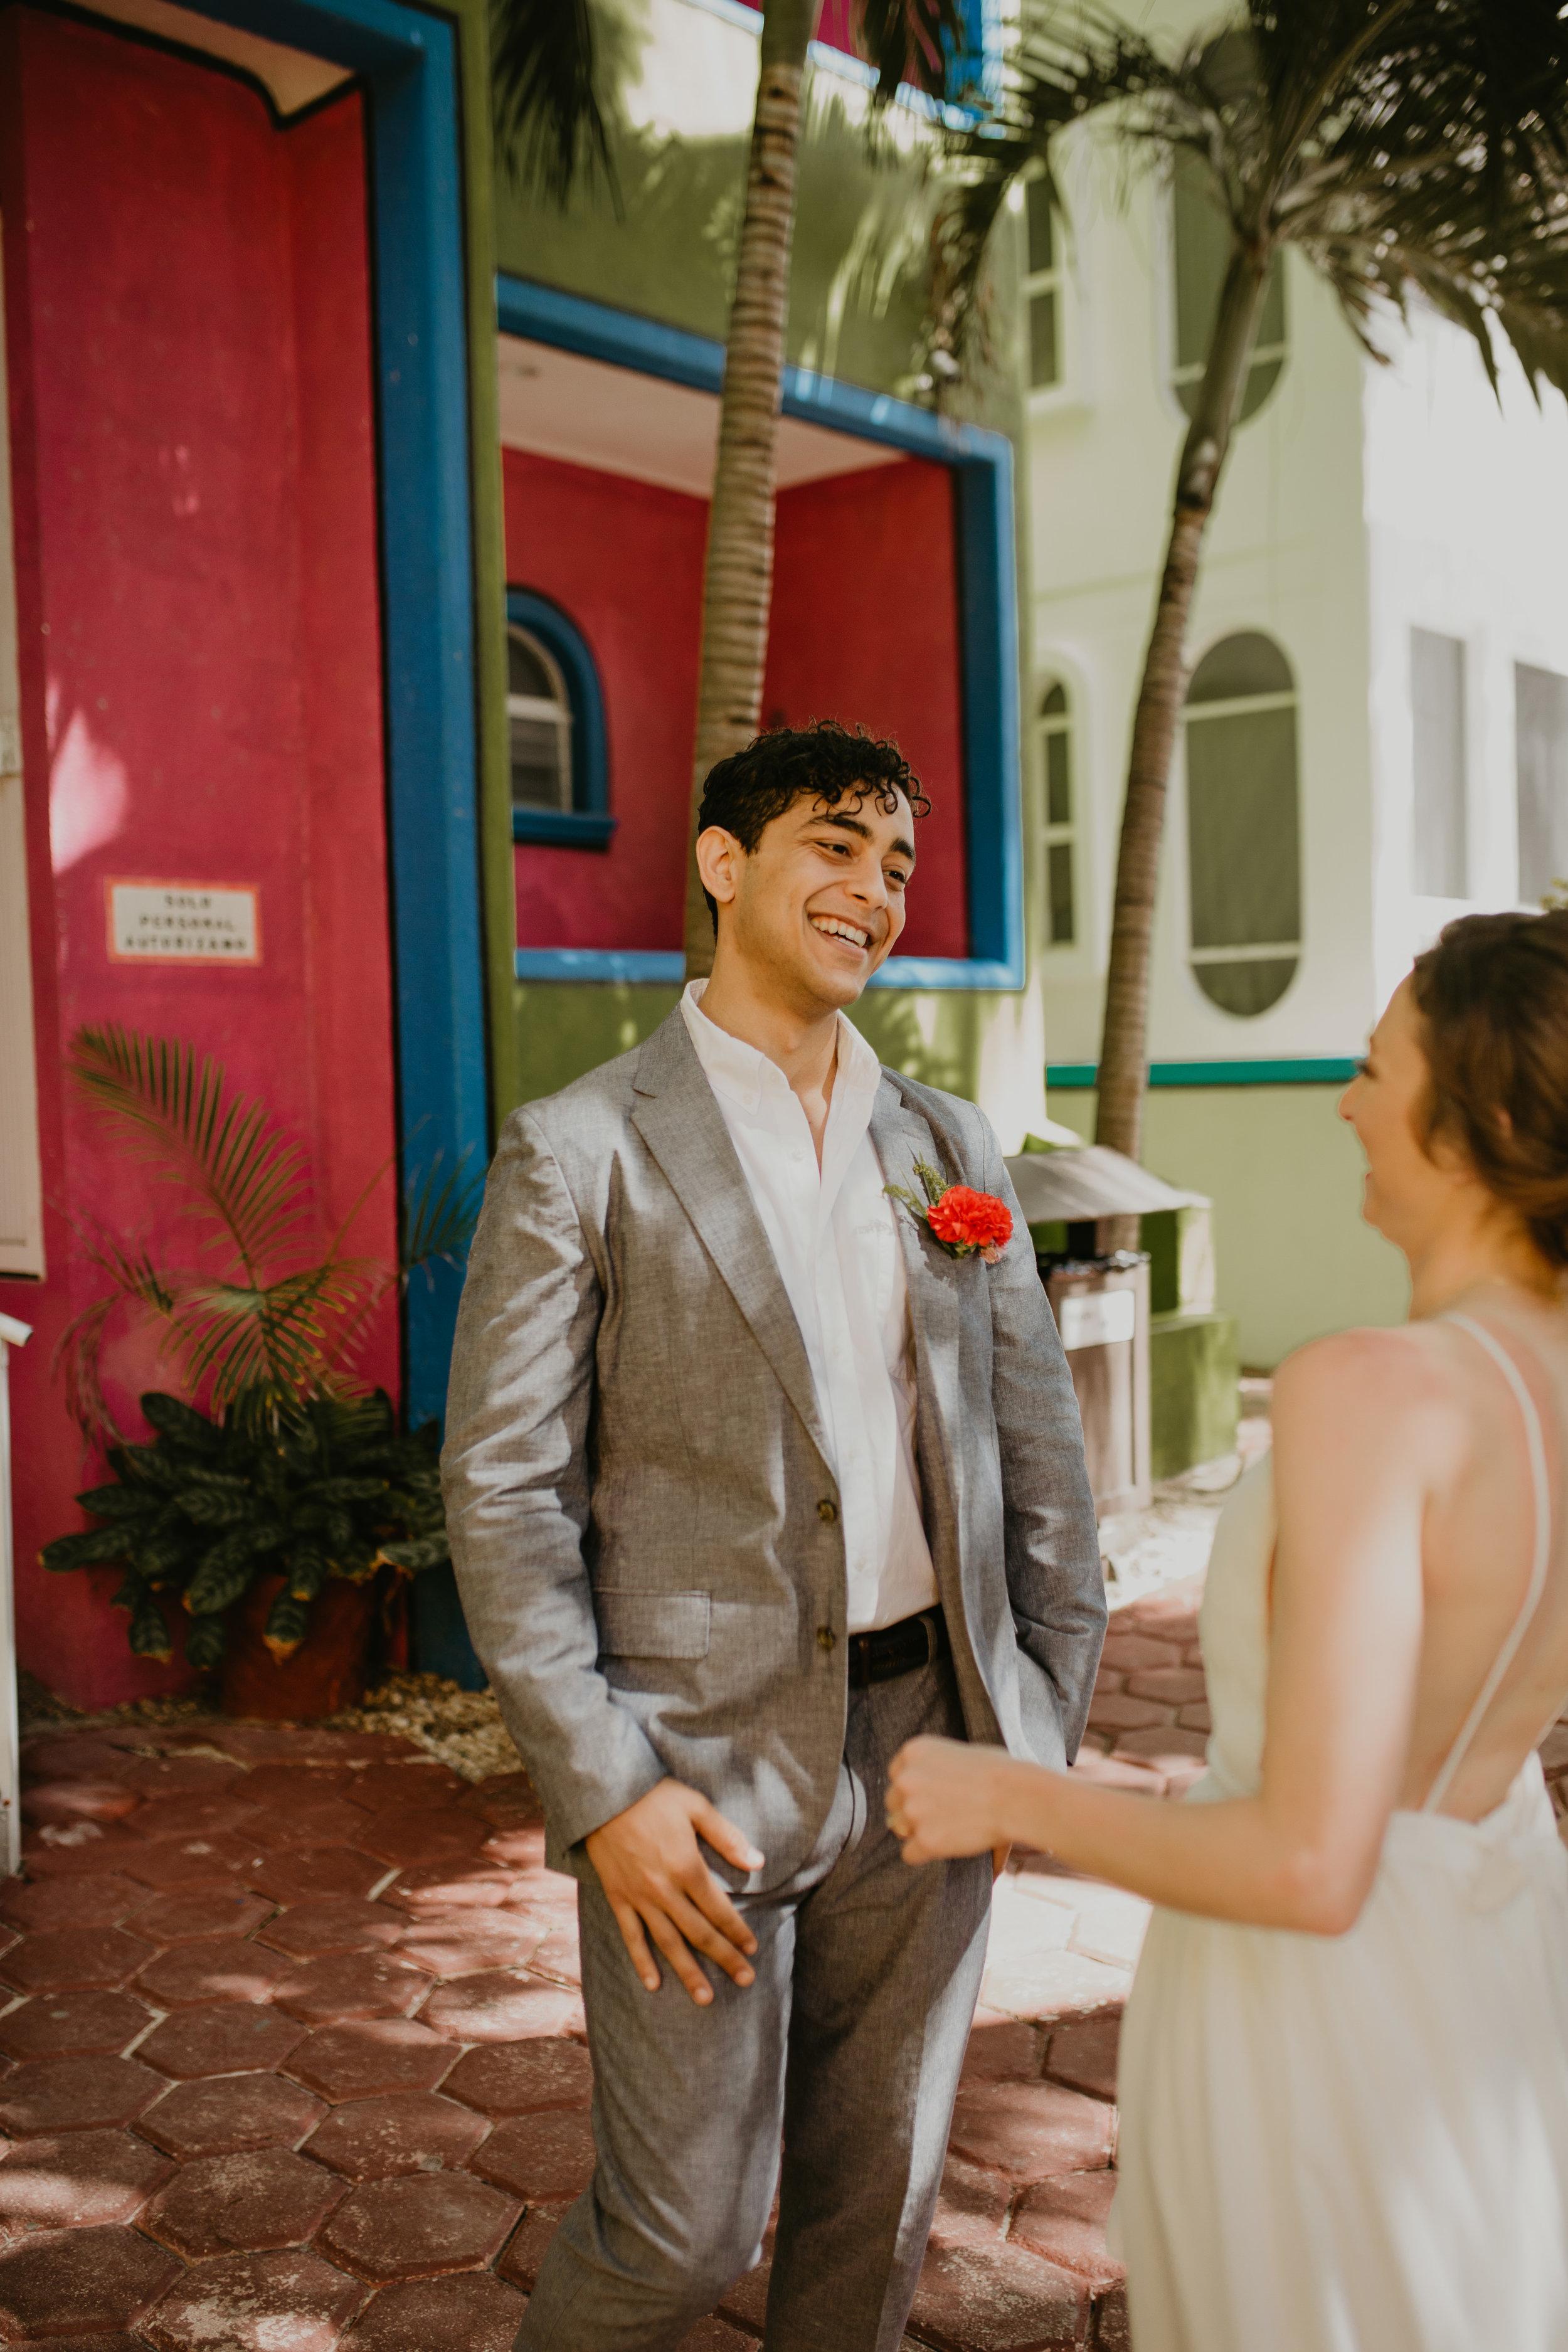 Nicole-Daacke-Photography-beachfront-akumal-destionation-wedding-tulum-mexico-elopement-photographer-destination-wedding-inspiration-sunset-champagne-pop-boho-bride-ocean-tropical-bohemian-tulum-wedding-photos-103.jpg